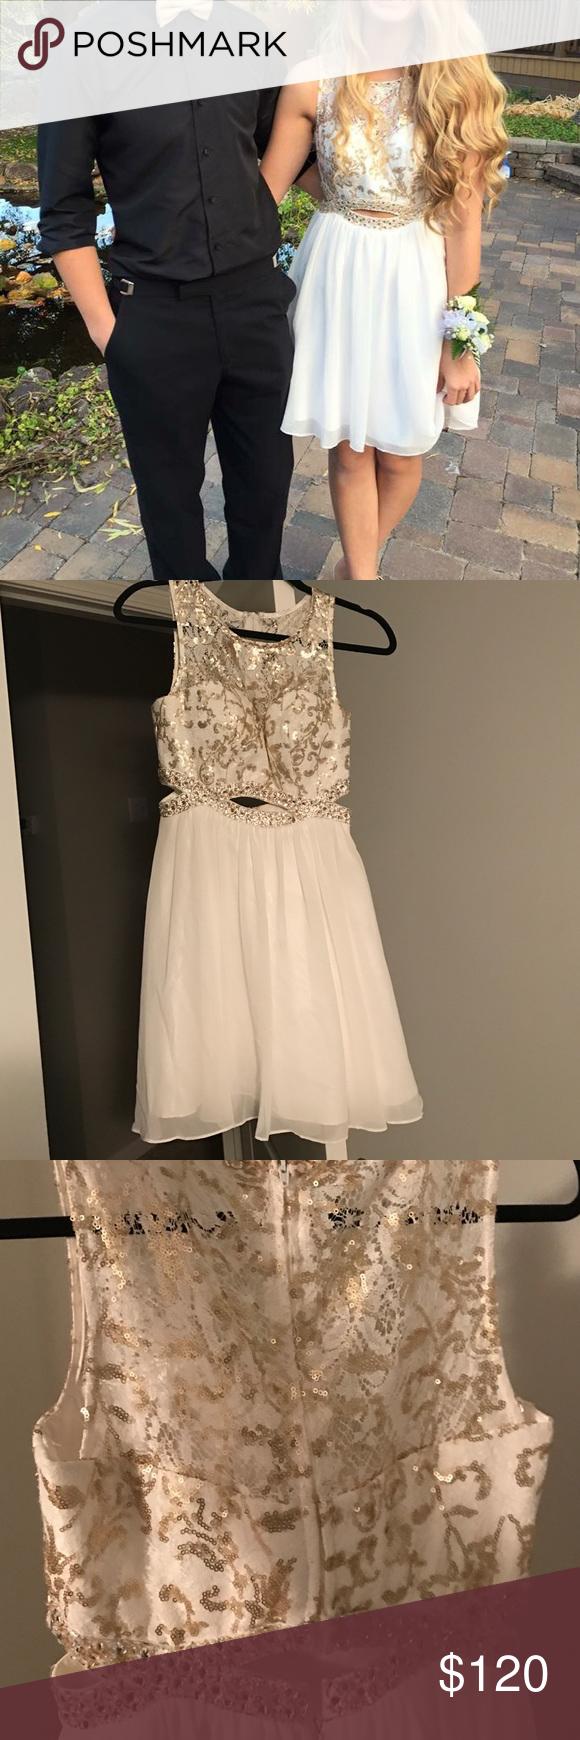 Short prom dress pinterest gold shorts short prom dresses and